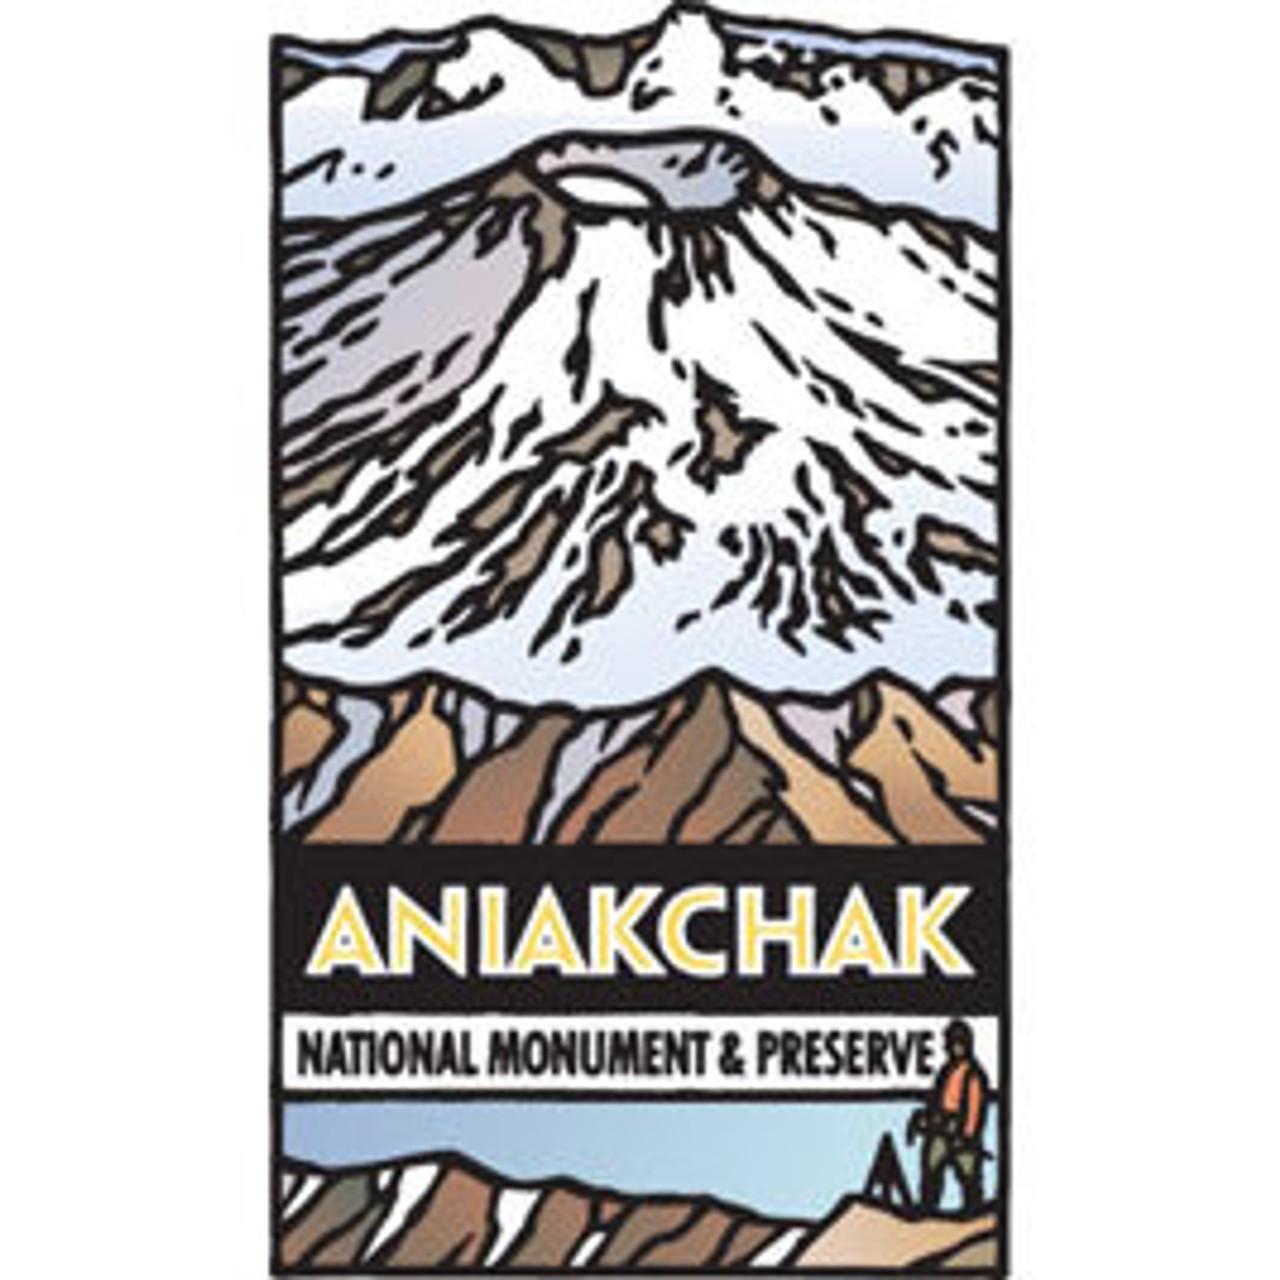 Aniakchak National Monument & Preserve